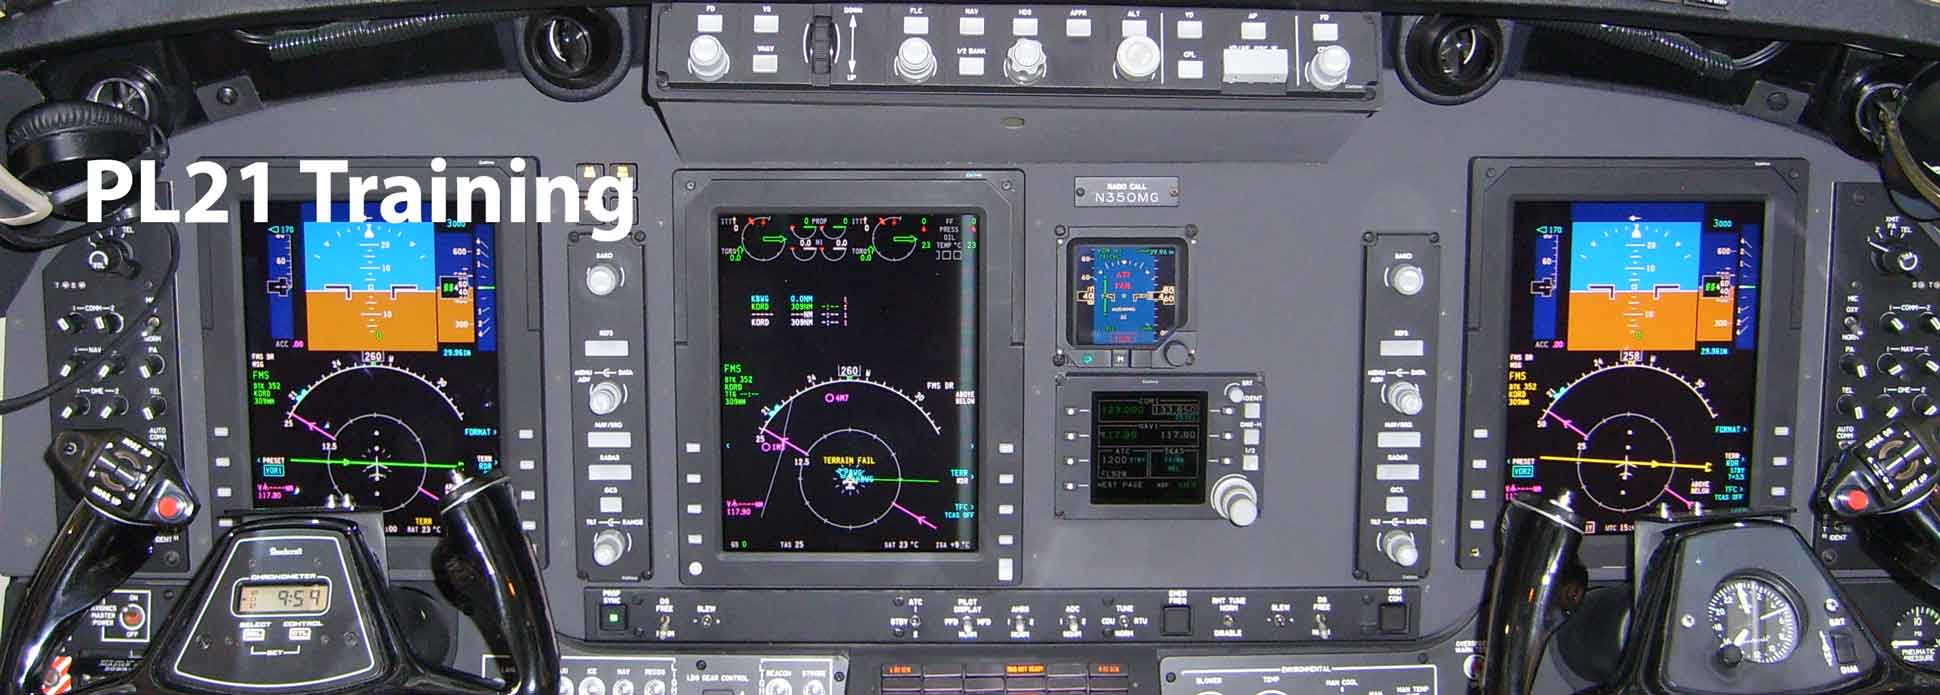 Rockwell Collins Proline 21 – CAMFLIGHT – Advanced Avionics